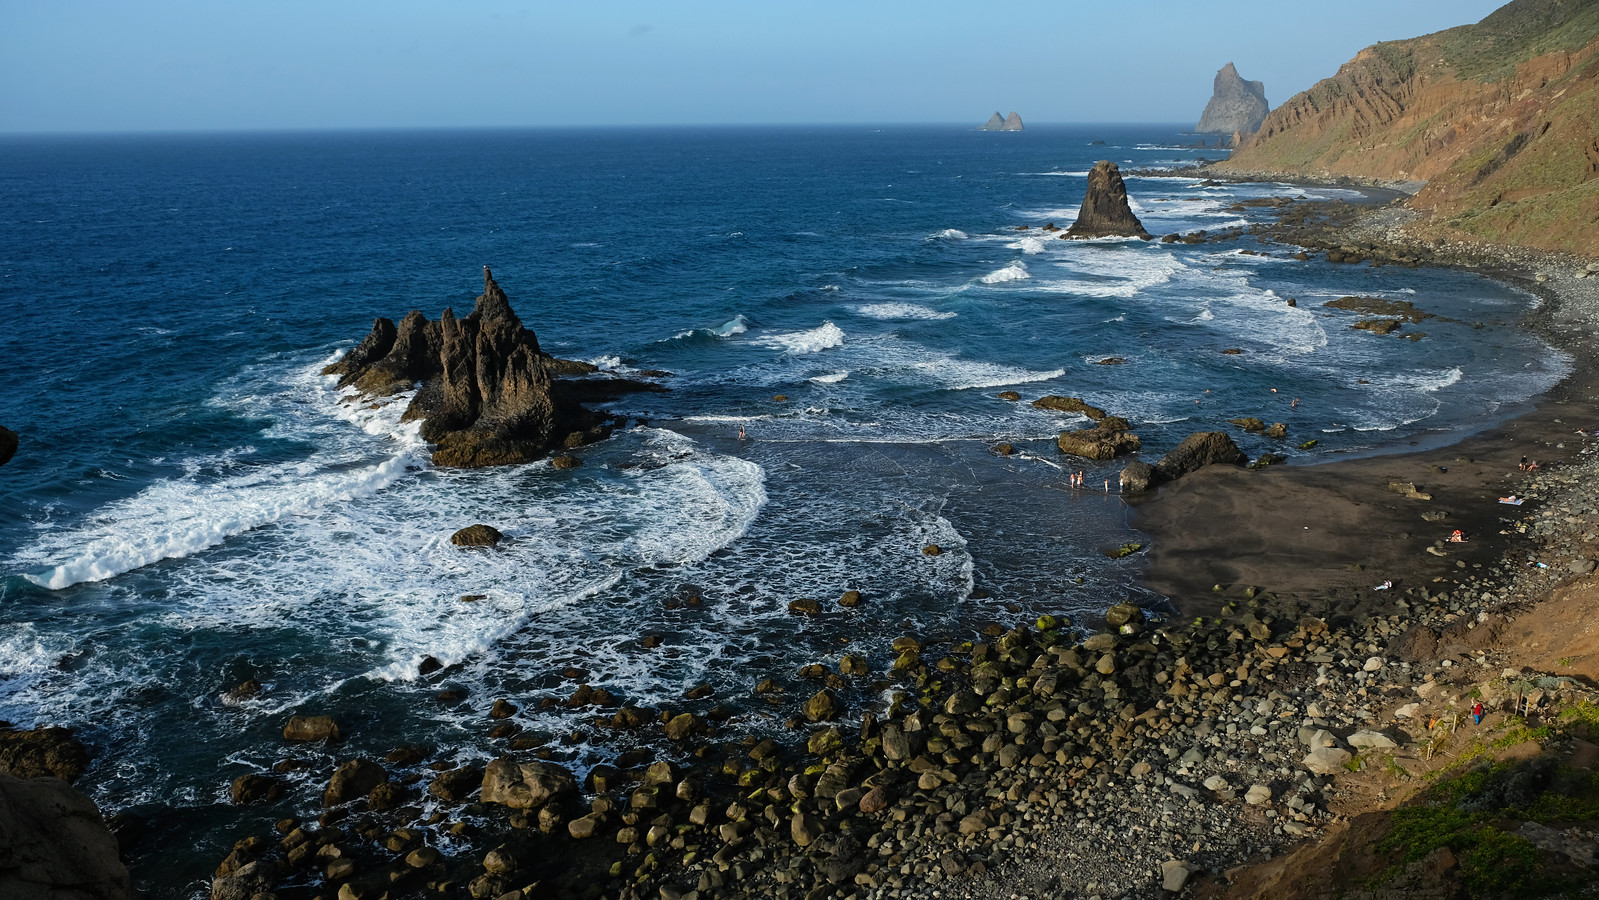 Benijo Beach, Tenerife, Canary Islands, Spain